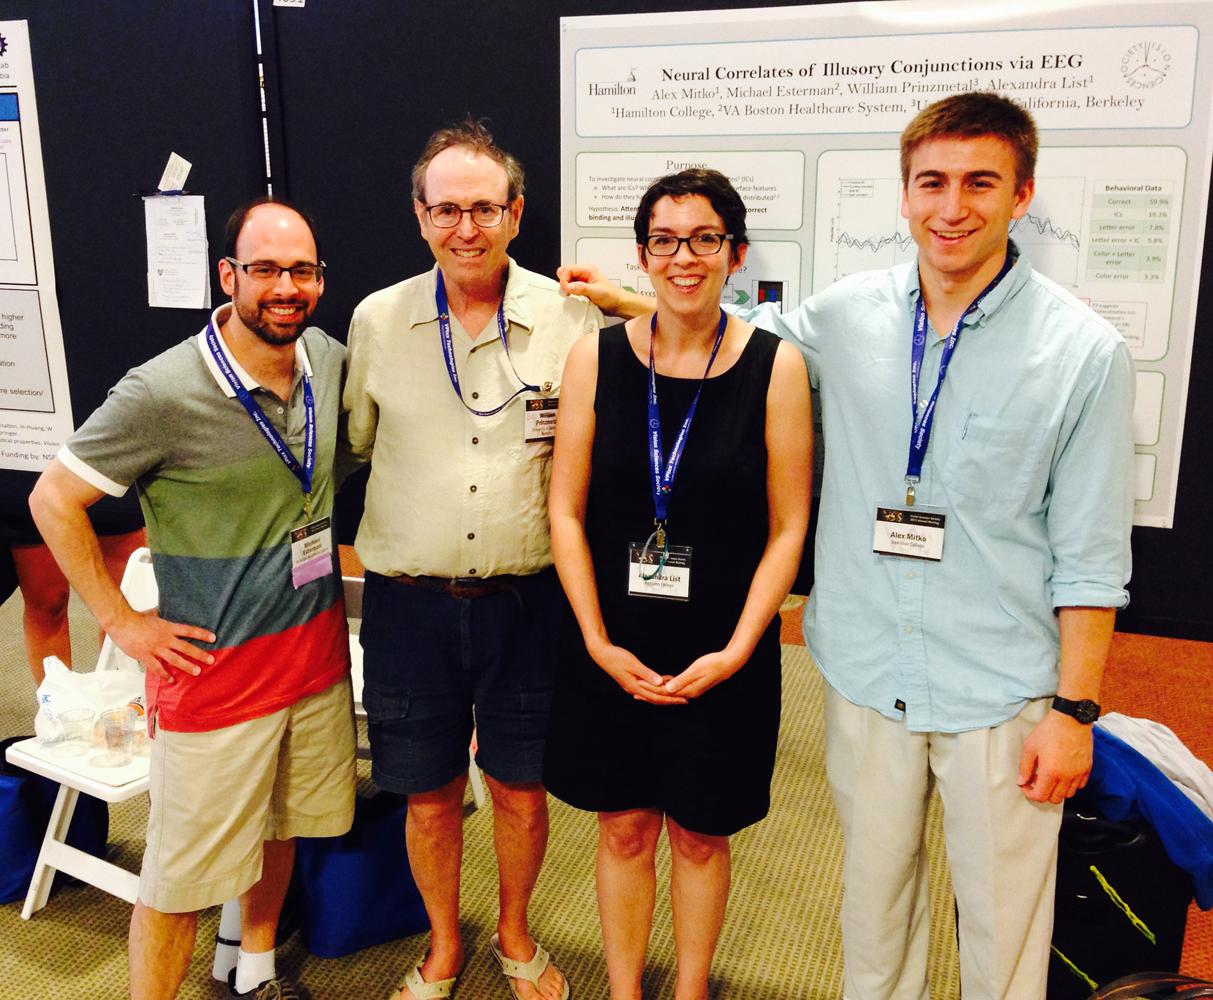 From left: Michael Esterman, William Prinzmetal, Alexandra List and Alex Mitko '16